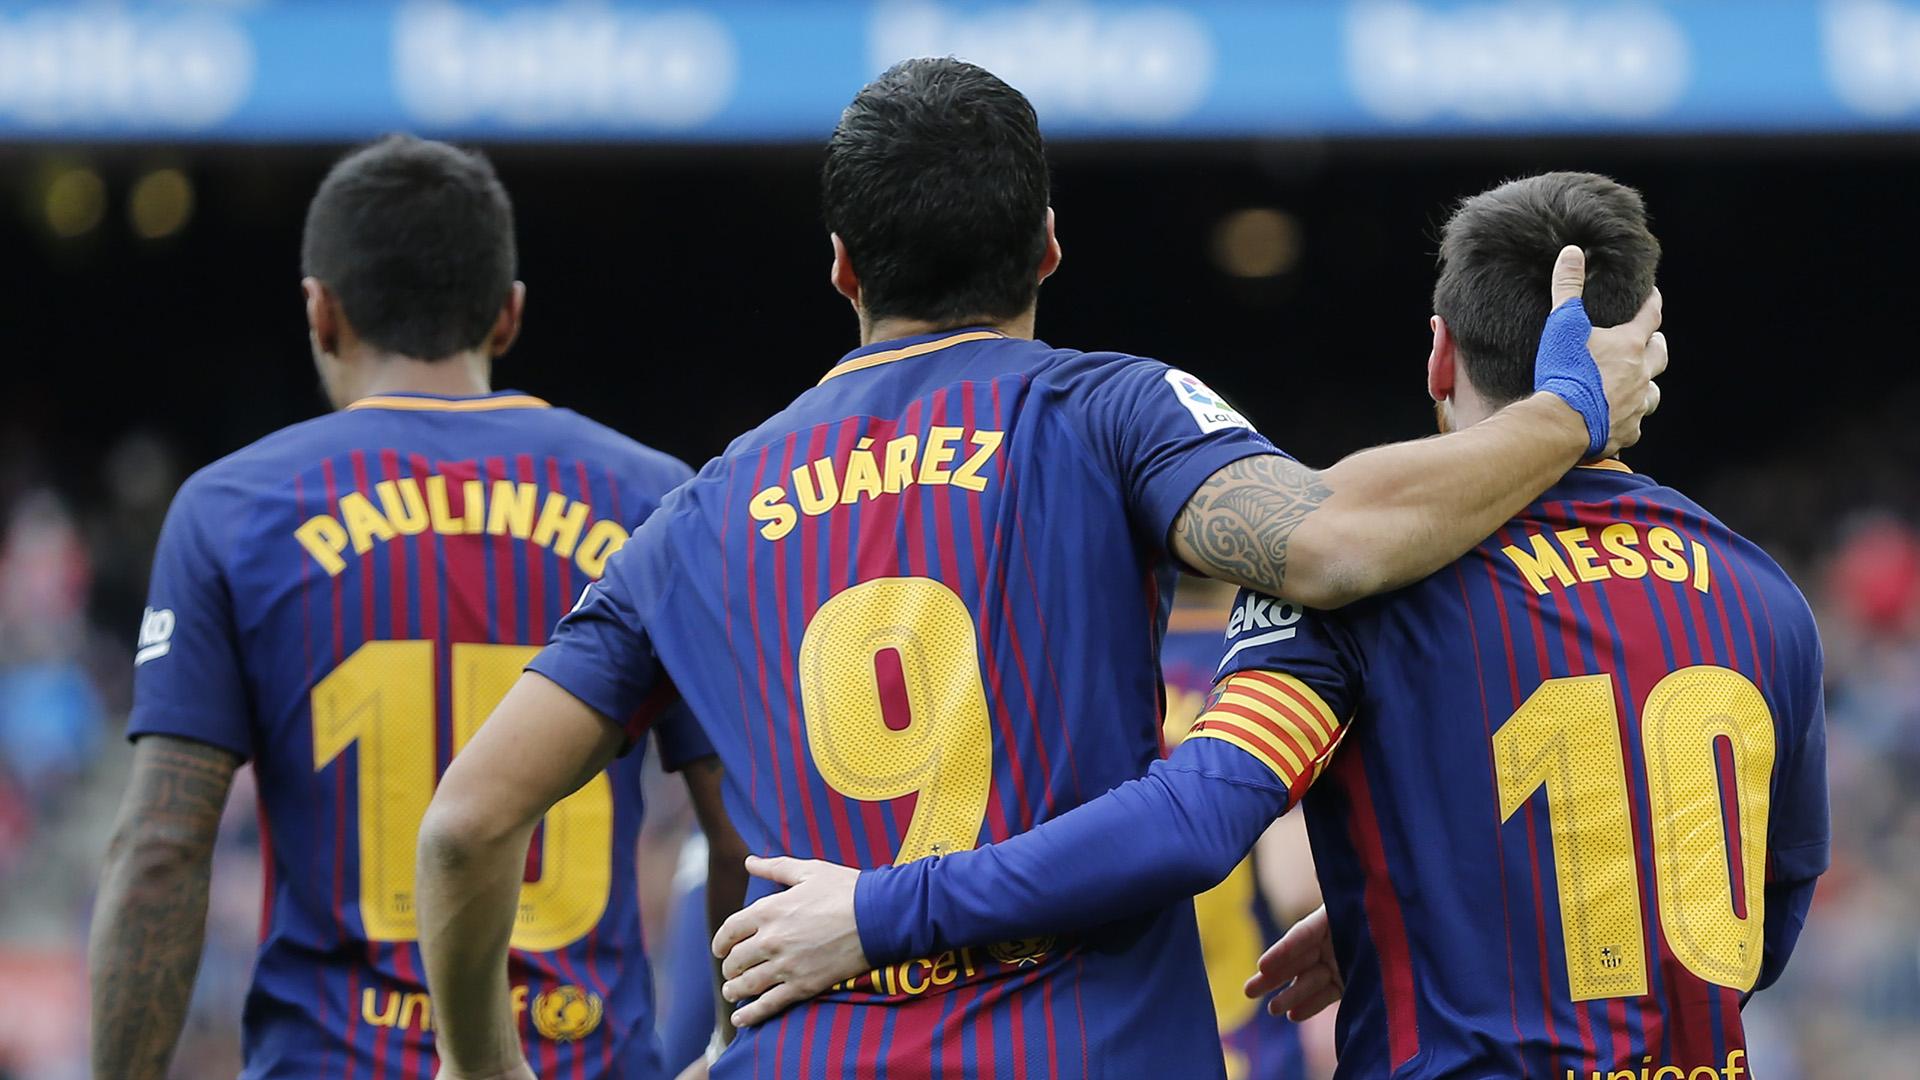 Barcelona January transfer news: All the latest rumours ahead of winter window